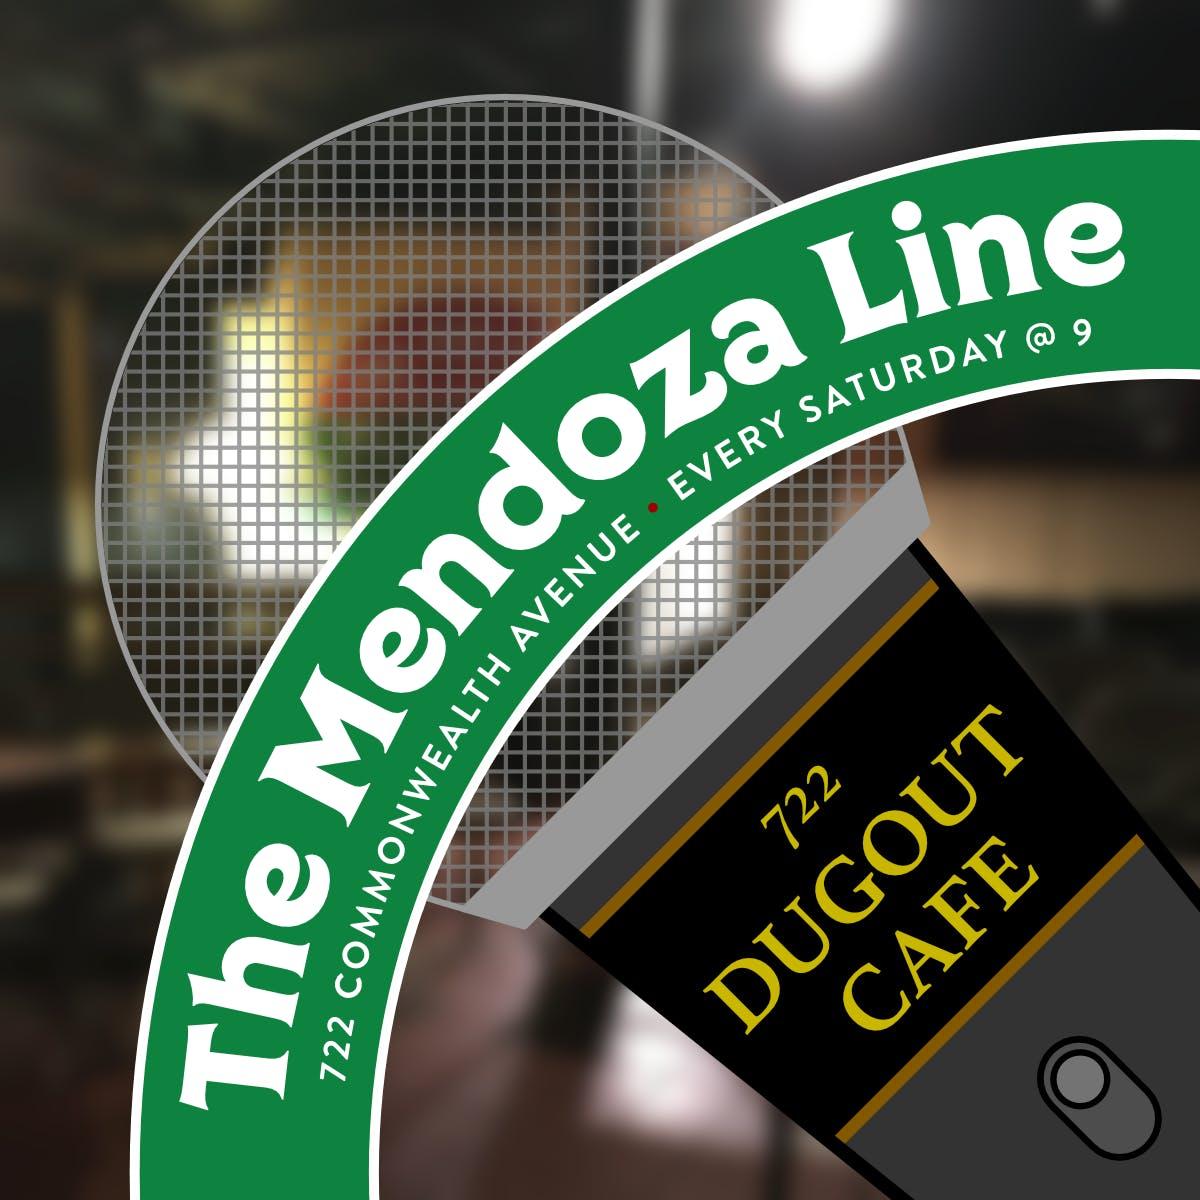 The Mendoza Line Comedy Show